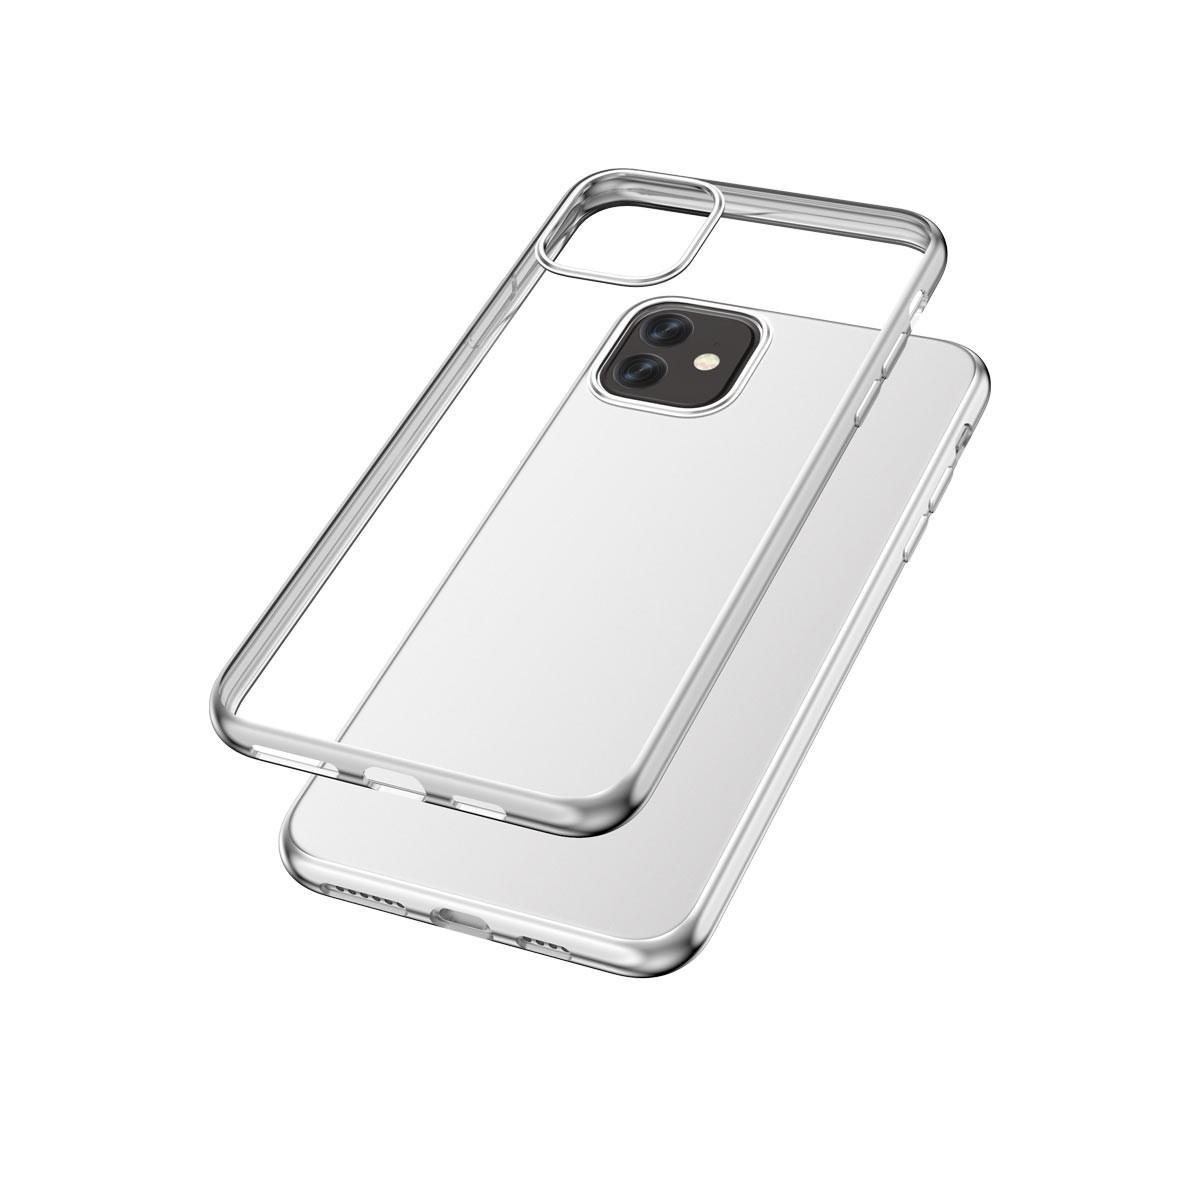 Capac protectie spate cellara colectia electro pentru iphone 11 - argintiu